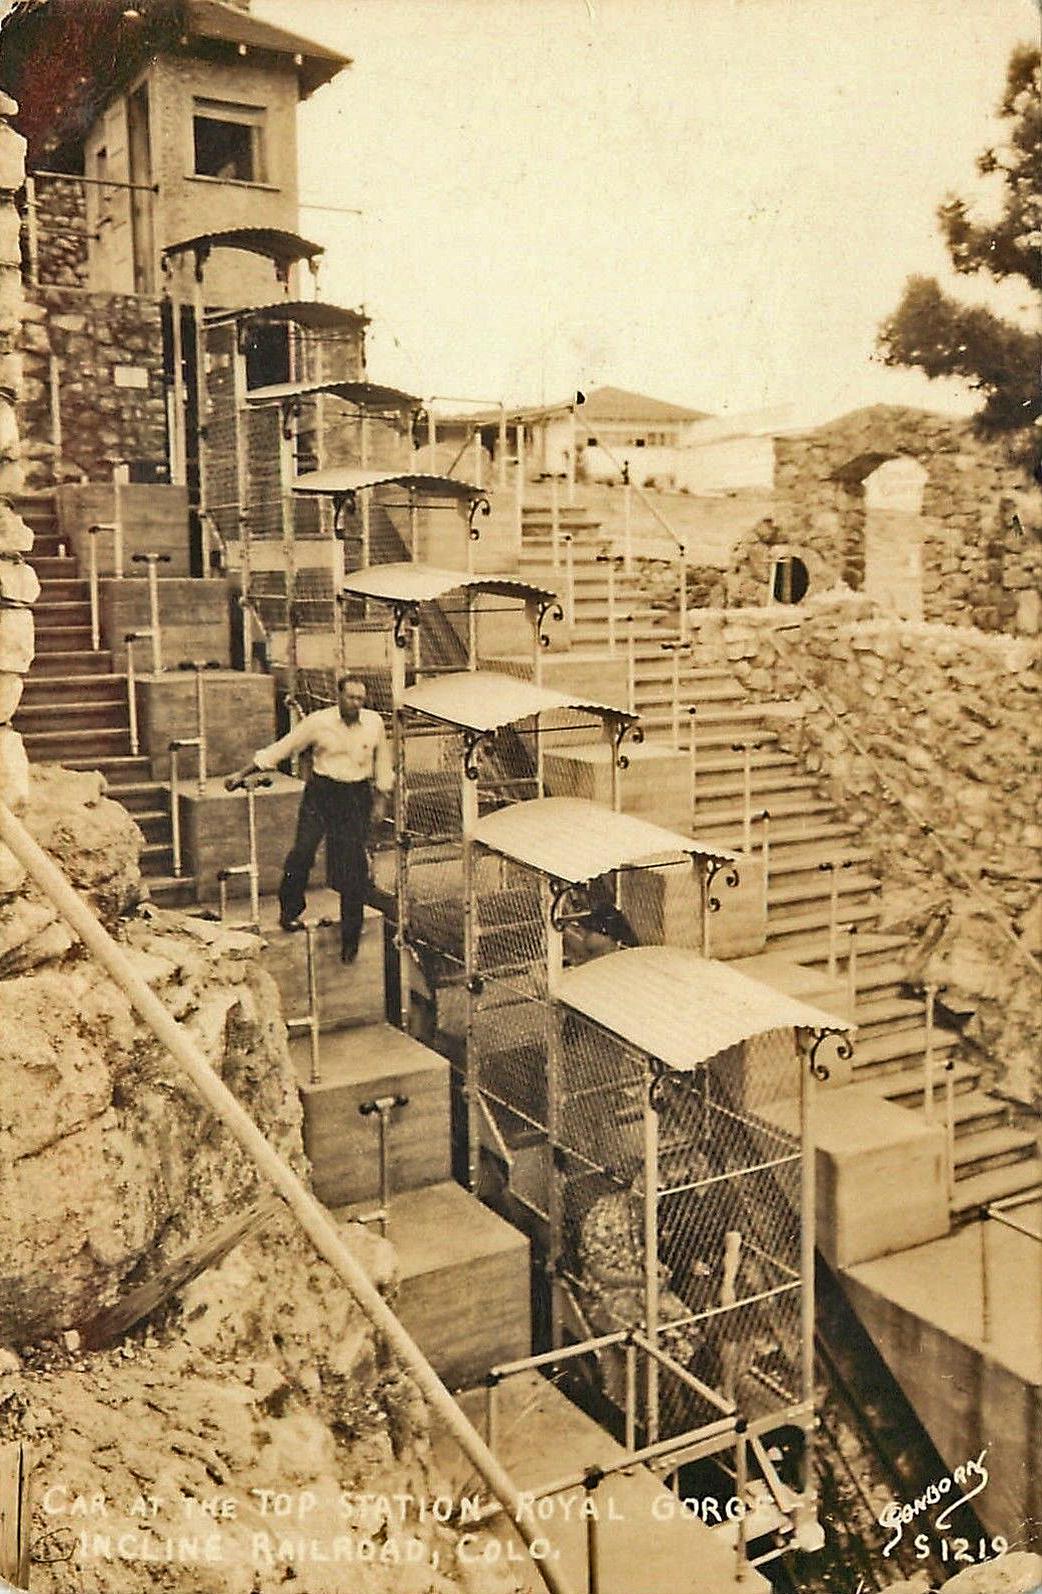 Royal Gorge Incline (1931-2013)